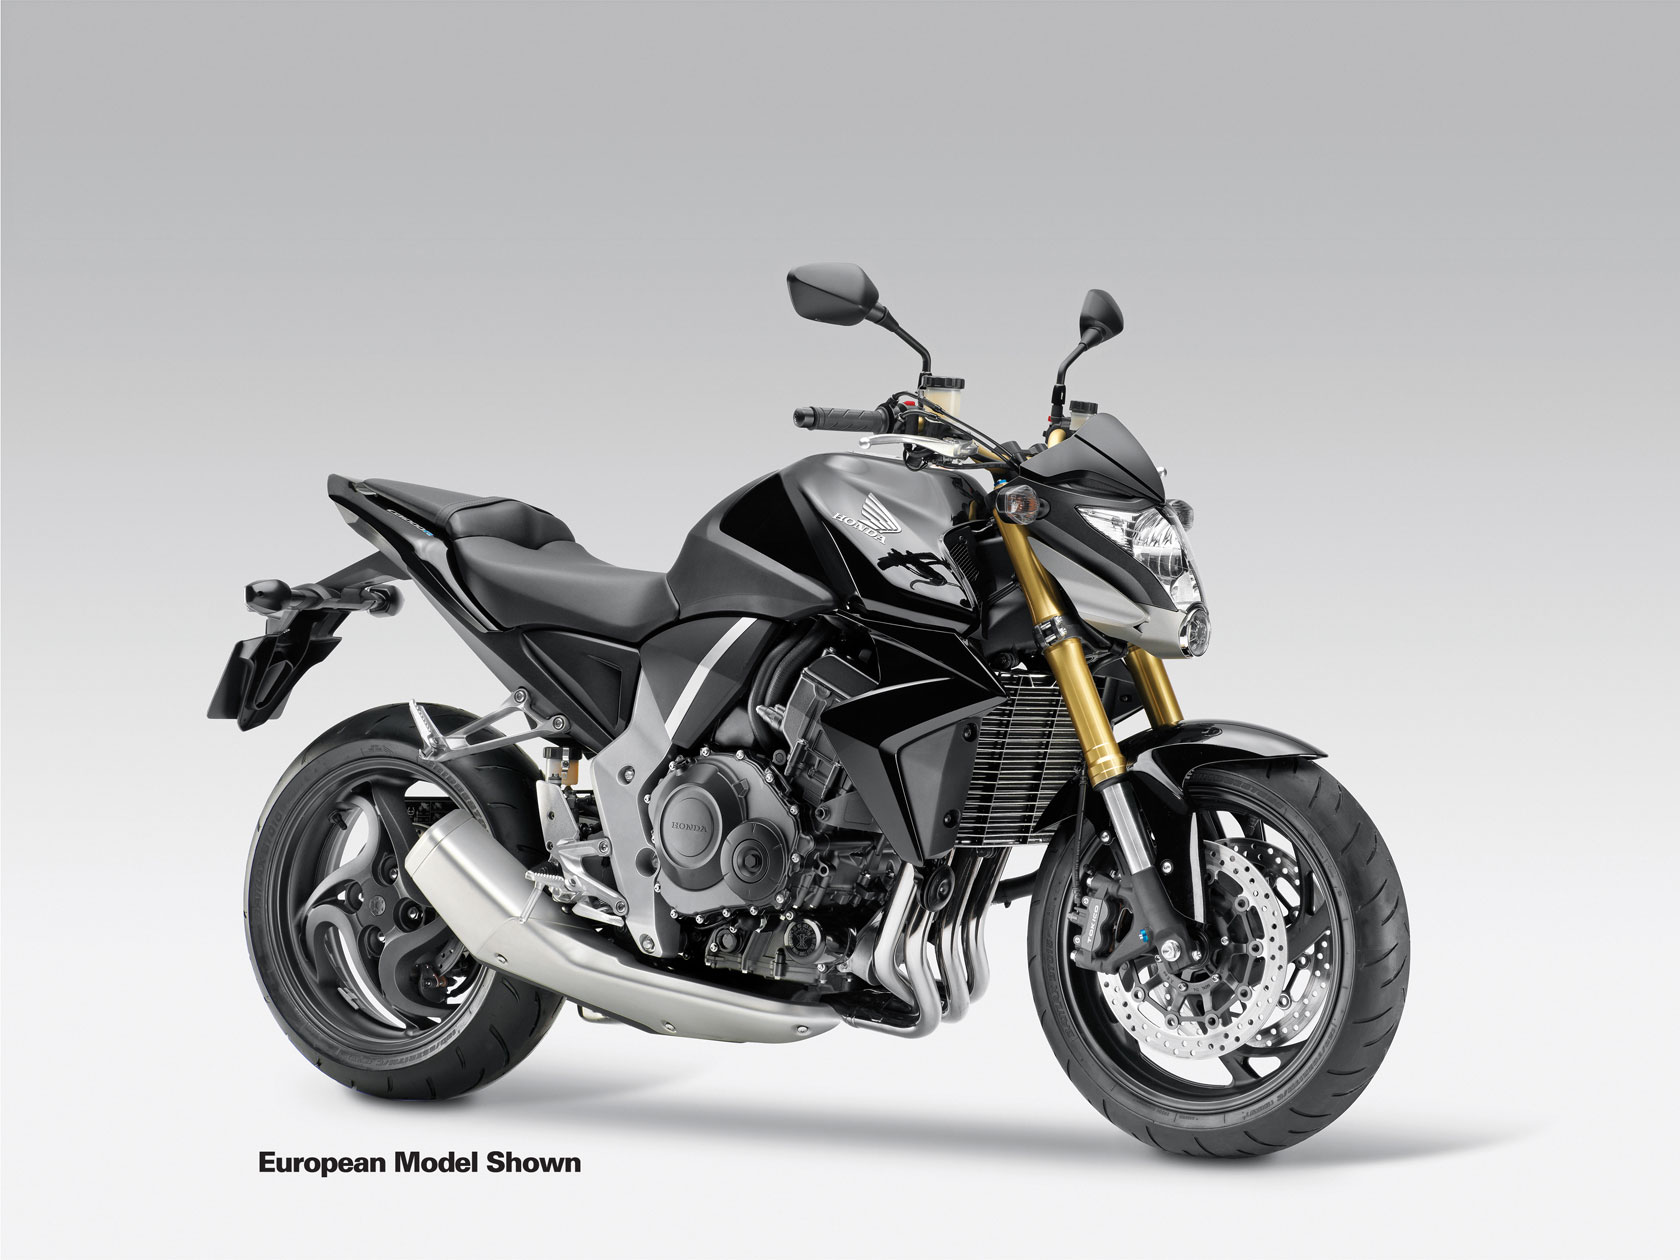 Honda Motorcycle Cbr Sportbike Free 220684 Wallpaper wallpaper